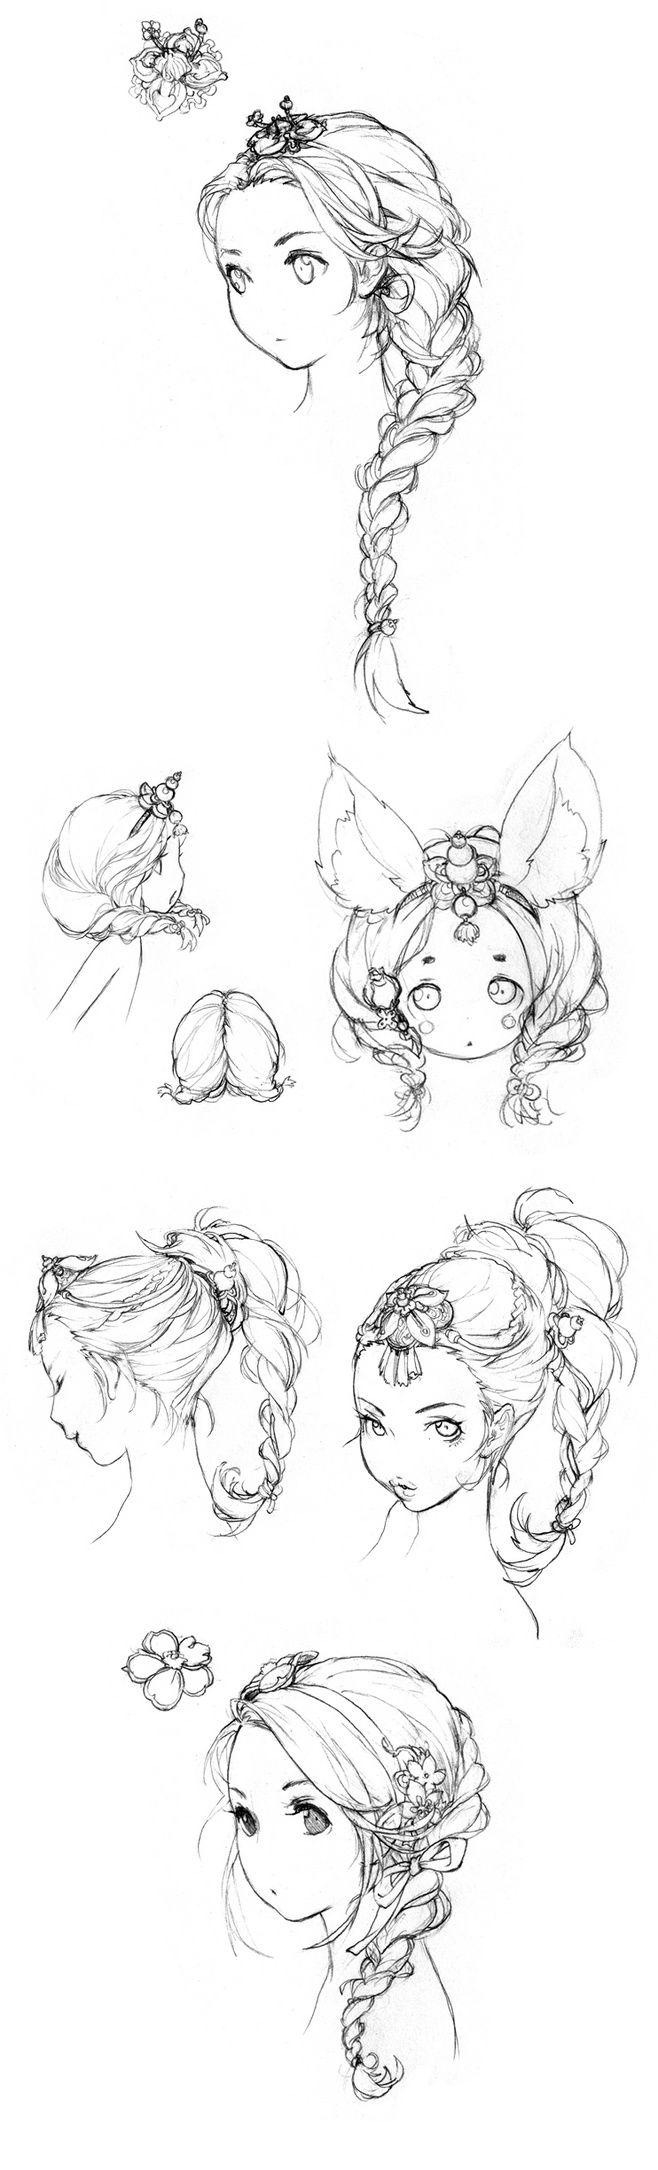 @yukina74采集到线稿(352图)_花瓣插画/漫画